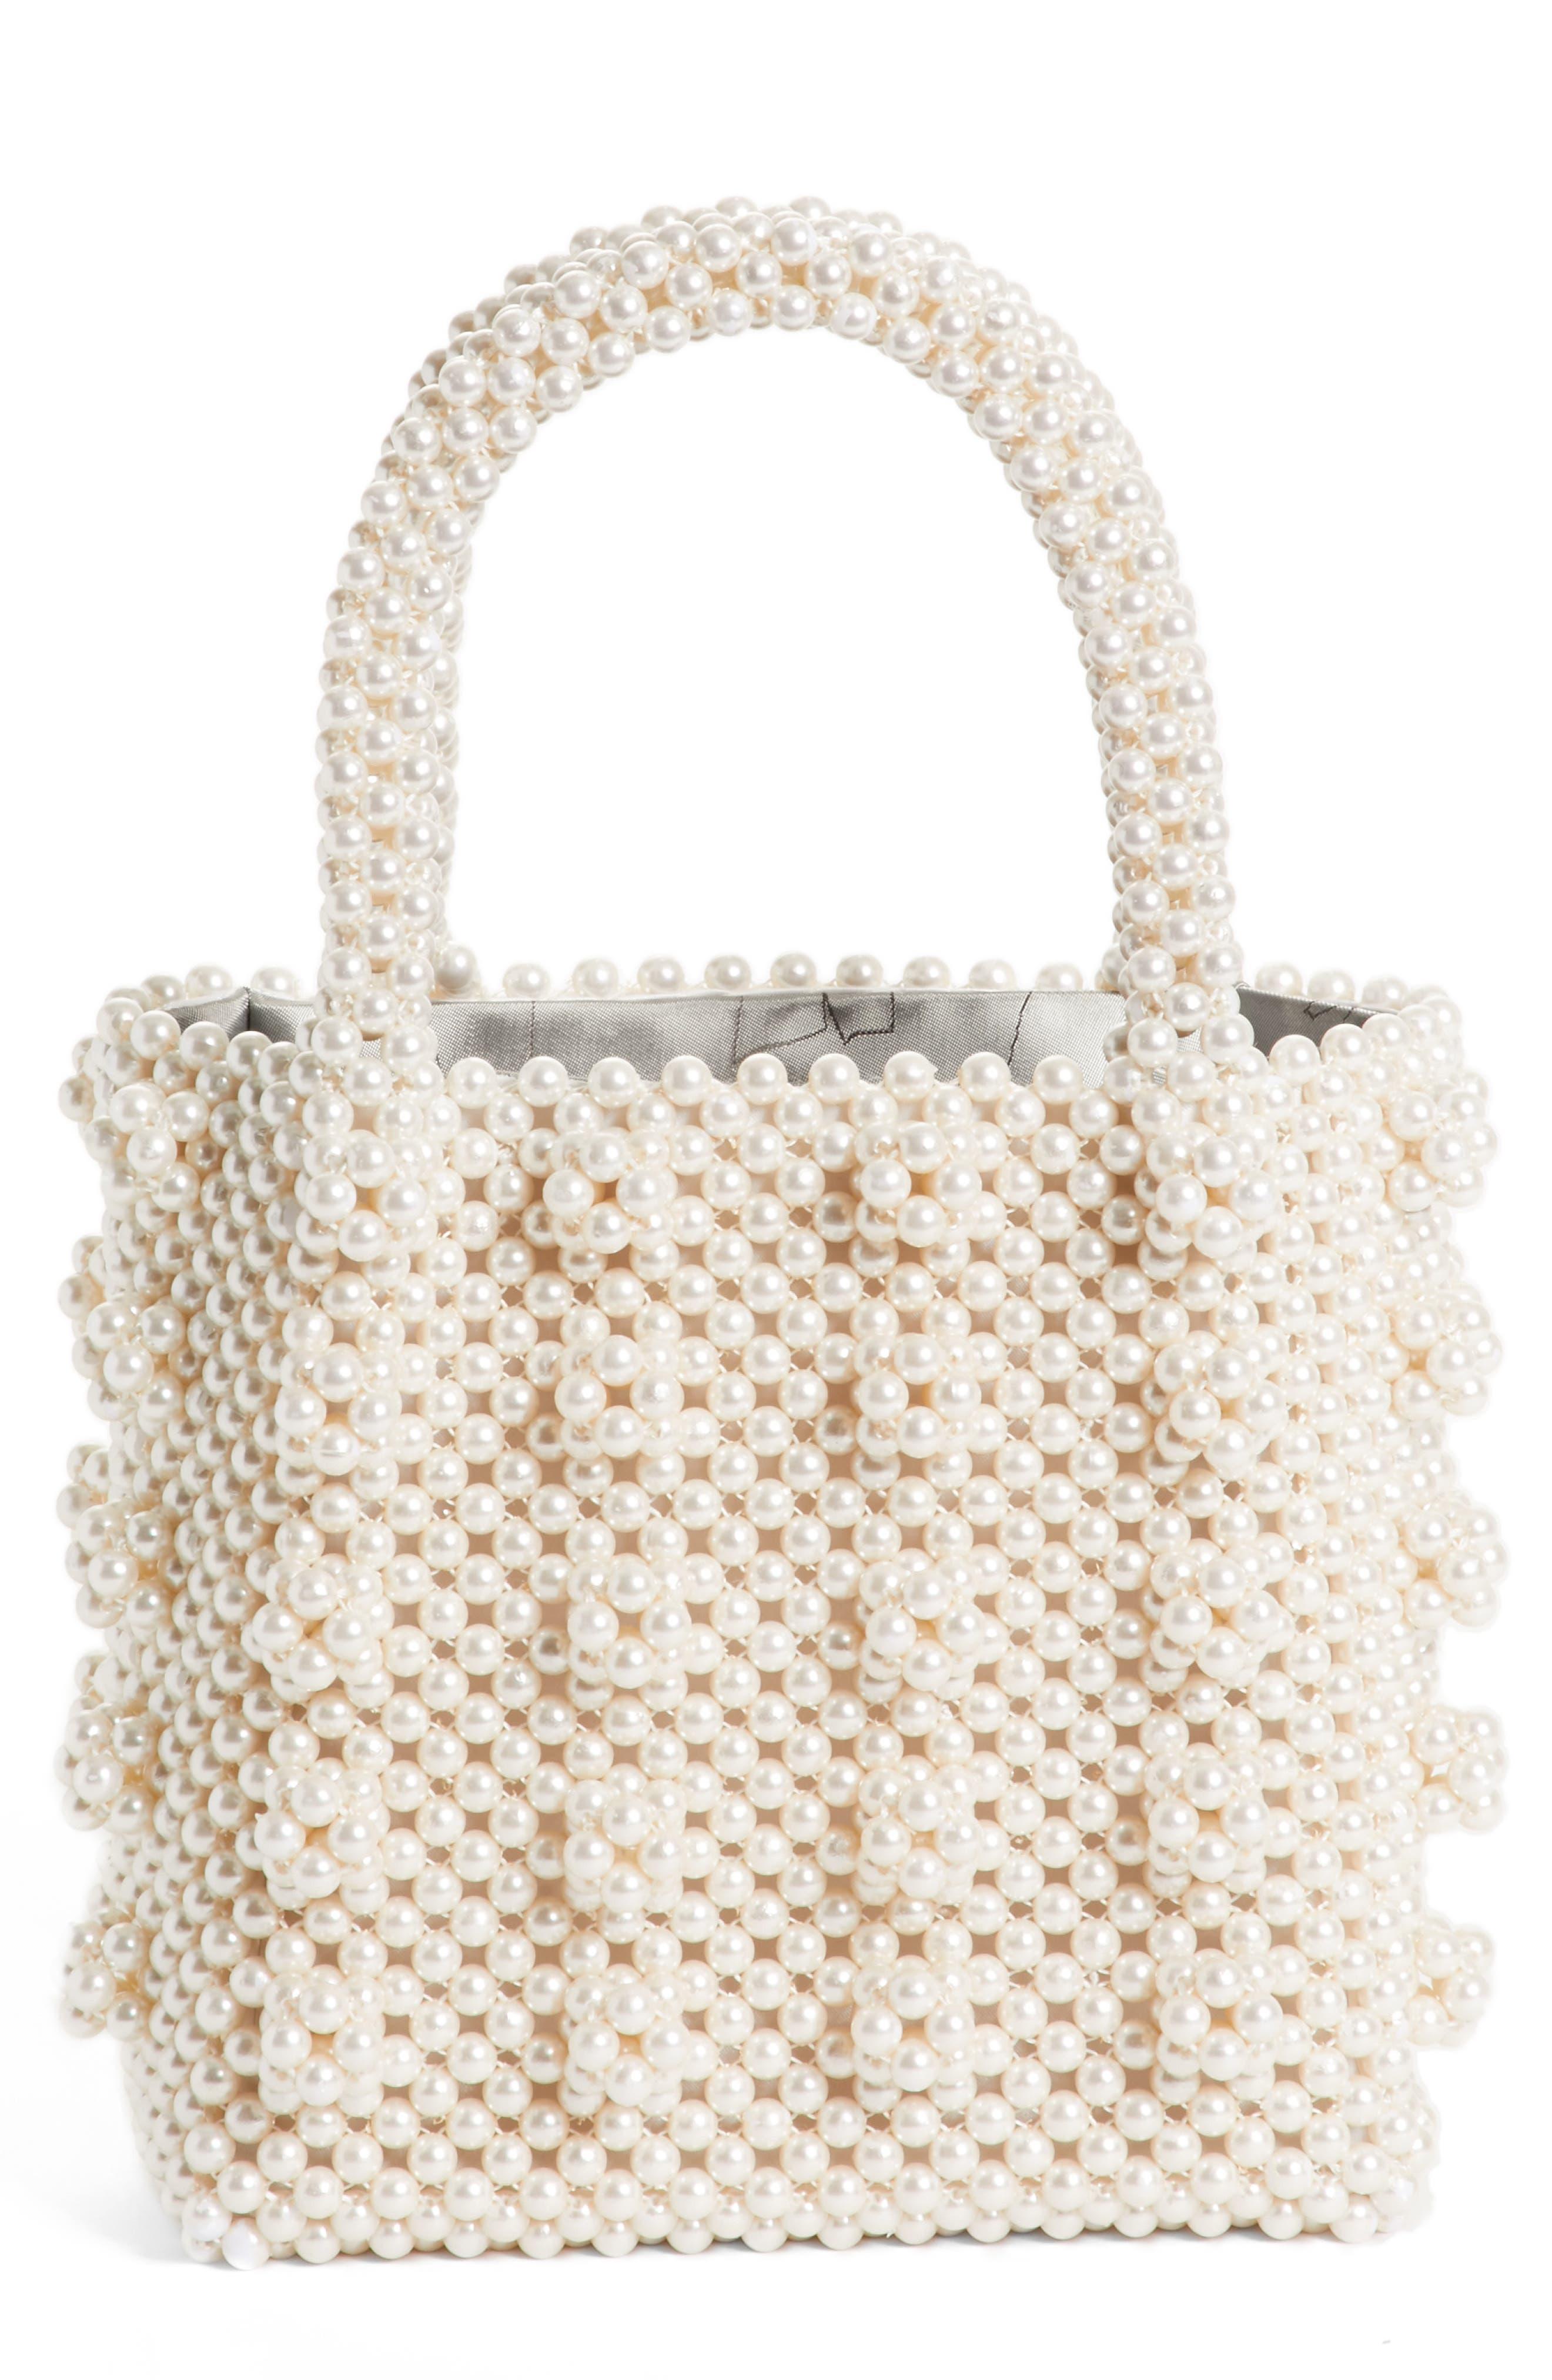 Antonia Small Imitation Pearl Beaded Handbag,                         Main,                         color, Cream